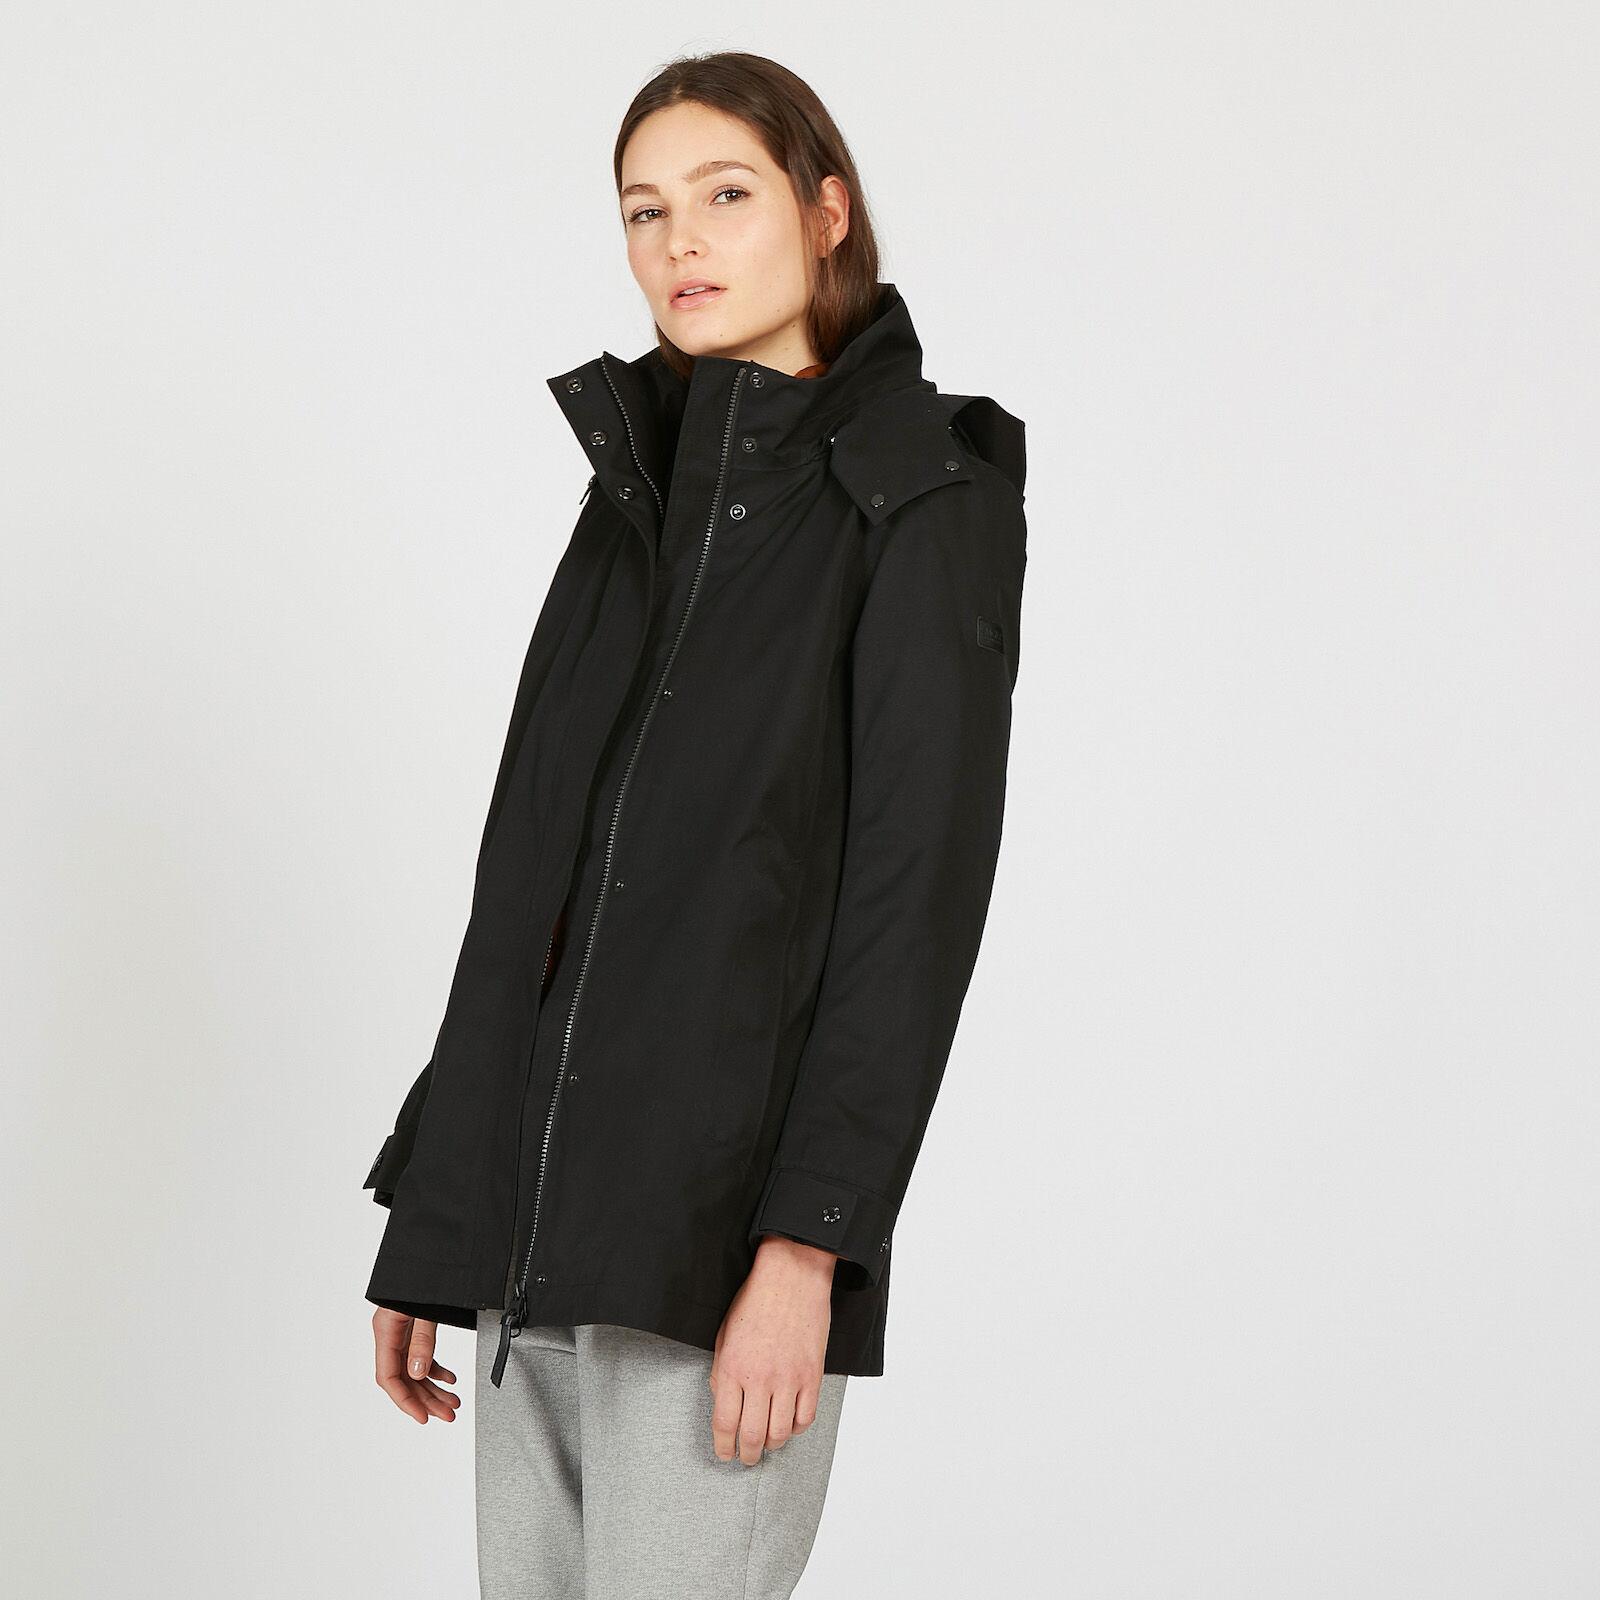 Manteau doudoune fine femme